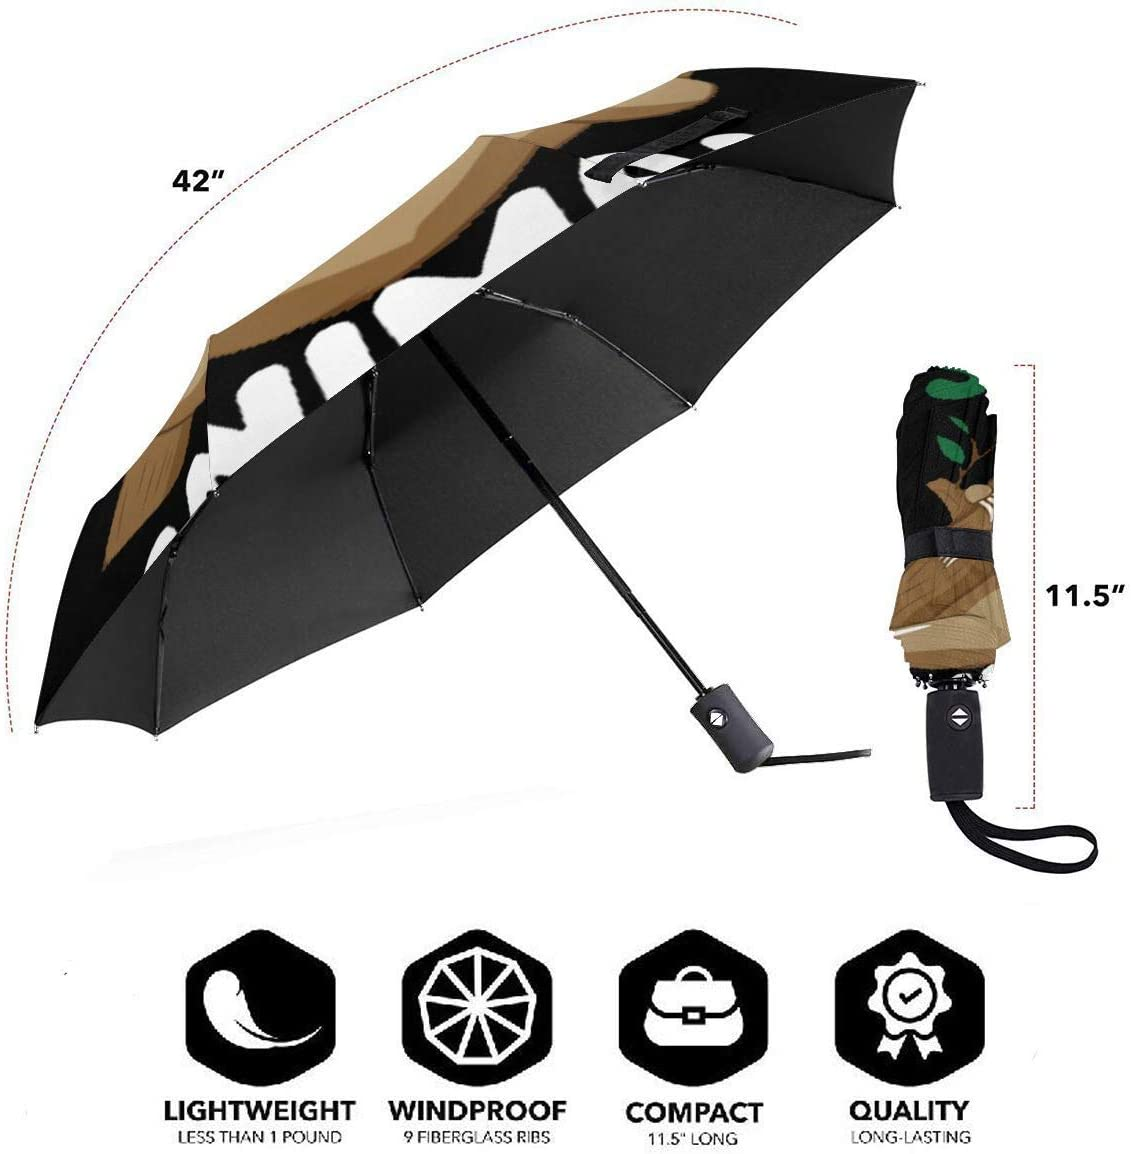 Anti-Slip Rubberized Grip aocostton Sweet Sloth Automatic Umbrella,Anti Uv Folding Sunblock Umbrella Windproof Sun Protection 11.5 Inch Compact and Lightweight